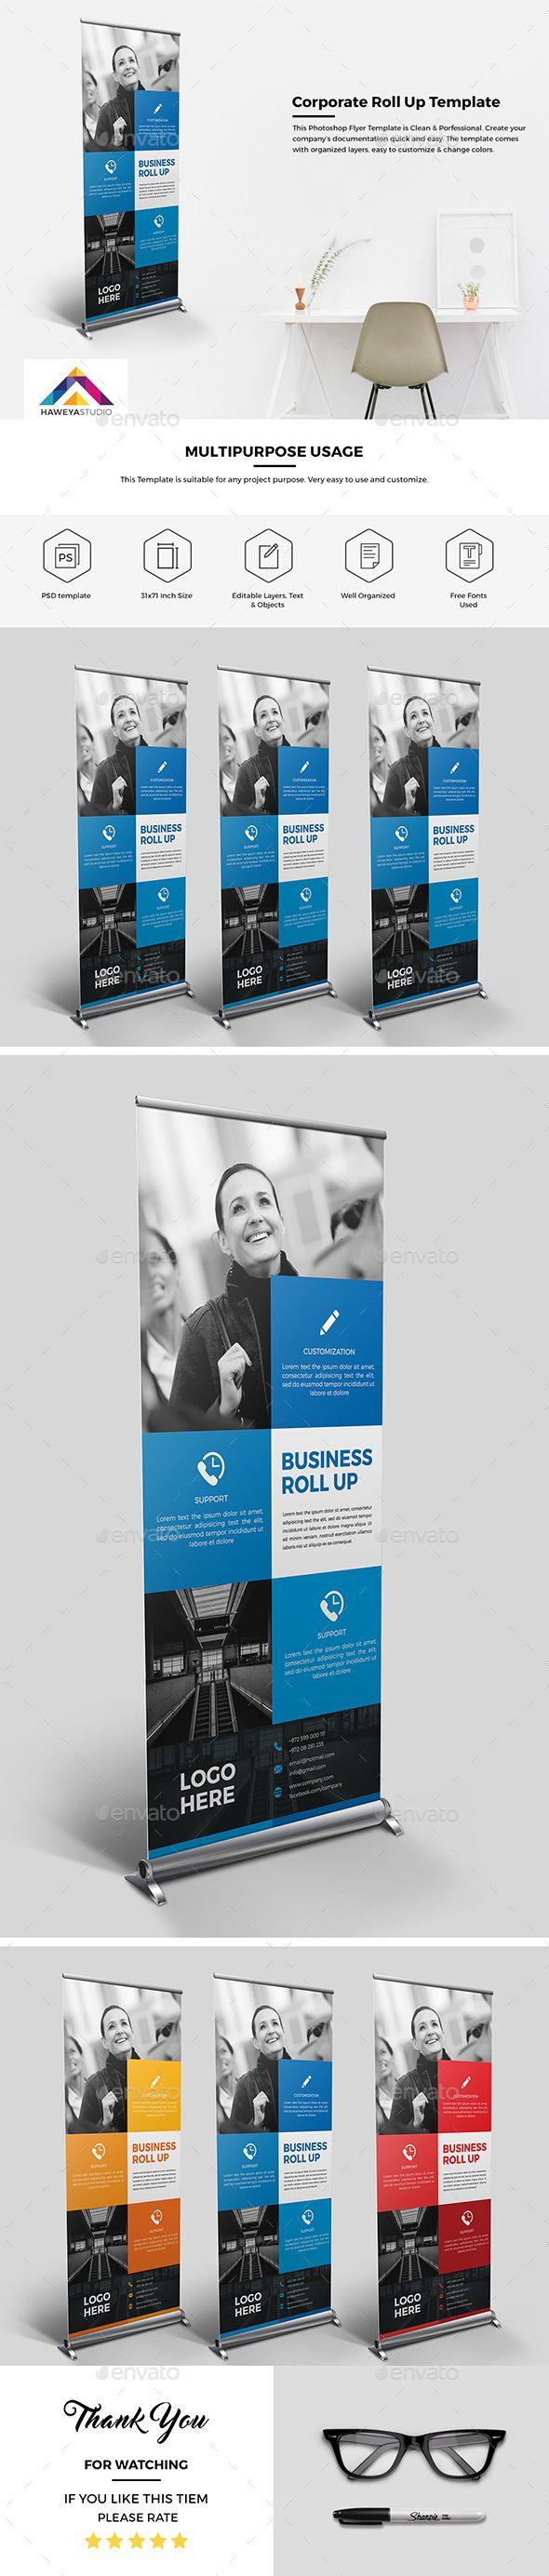 Haweya Corporate Roll-Up Template PSD. Download here: http://graphicriver.net/item/haweya-corporate-roll-up-01-/15682708?ref=ksioks